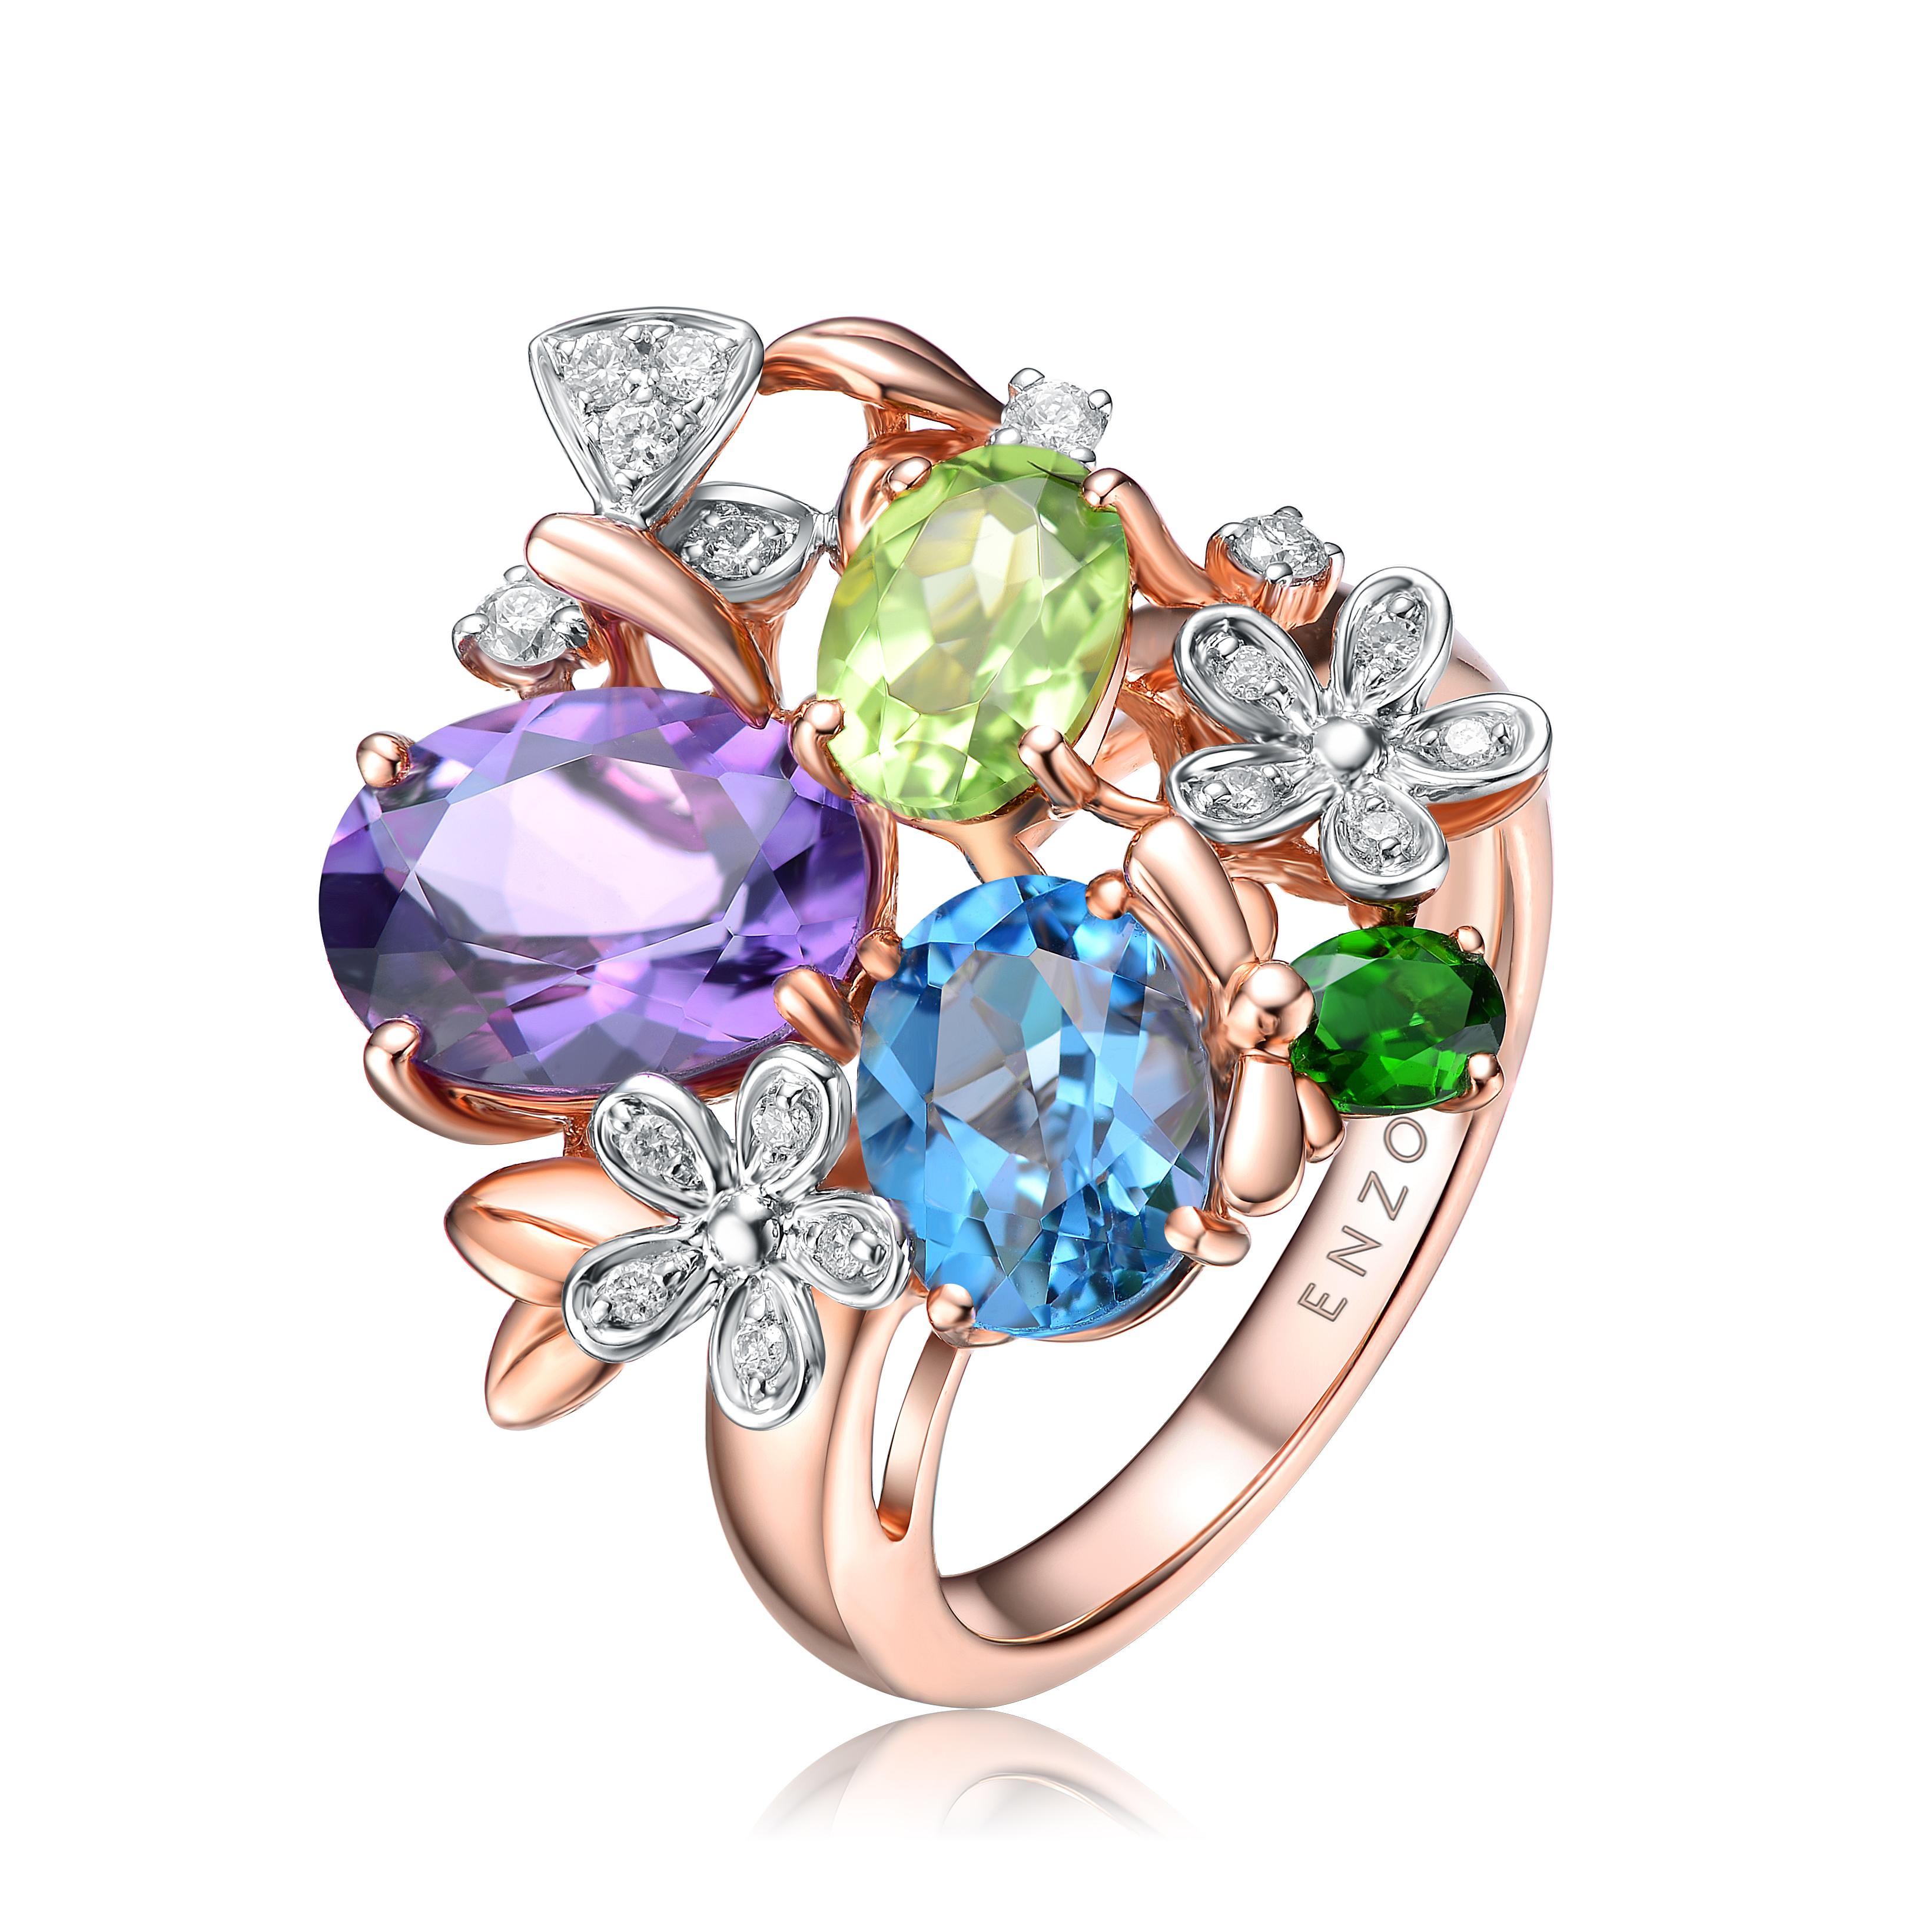 ENZO全新形象亮相深圳珠宝展,首次开放全国加盟业务